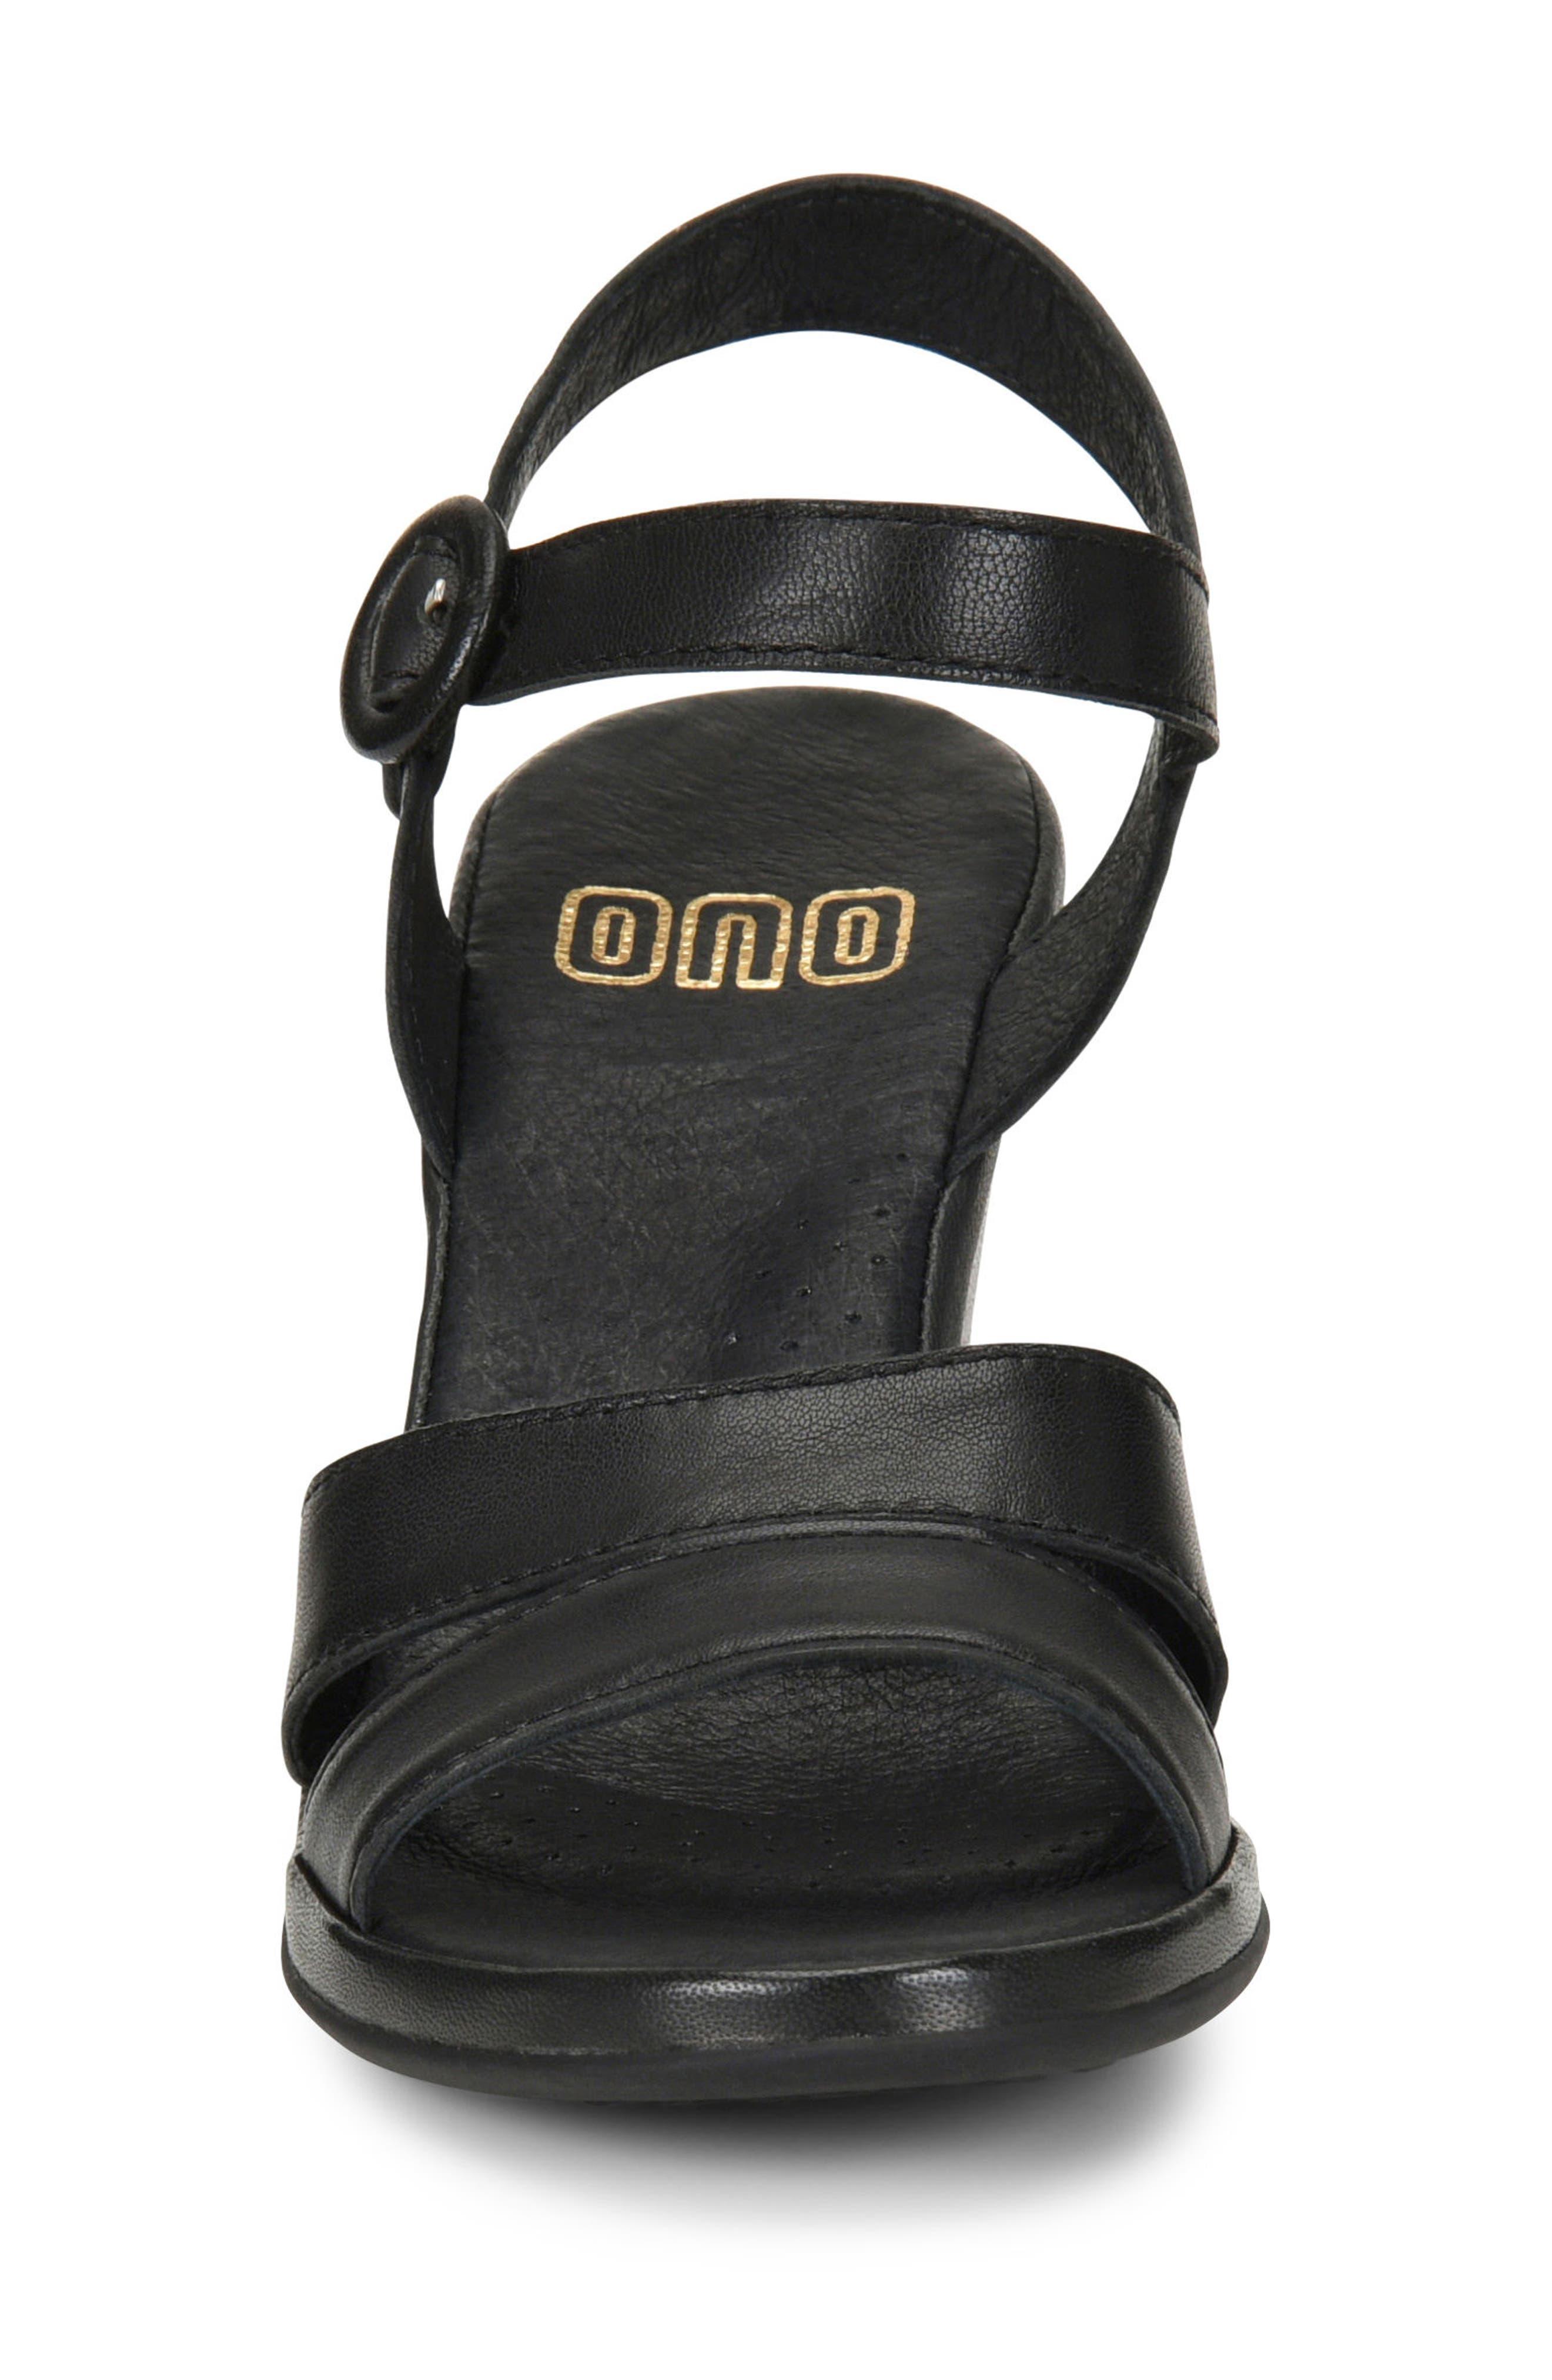 ONO, Hydro Wedge Sandal, Alternate thumbnail 4, color, BLACK LEATHER